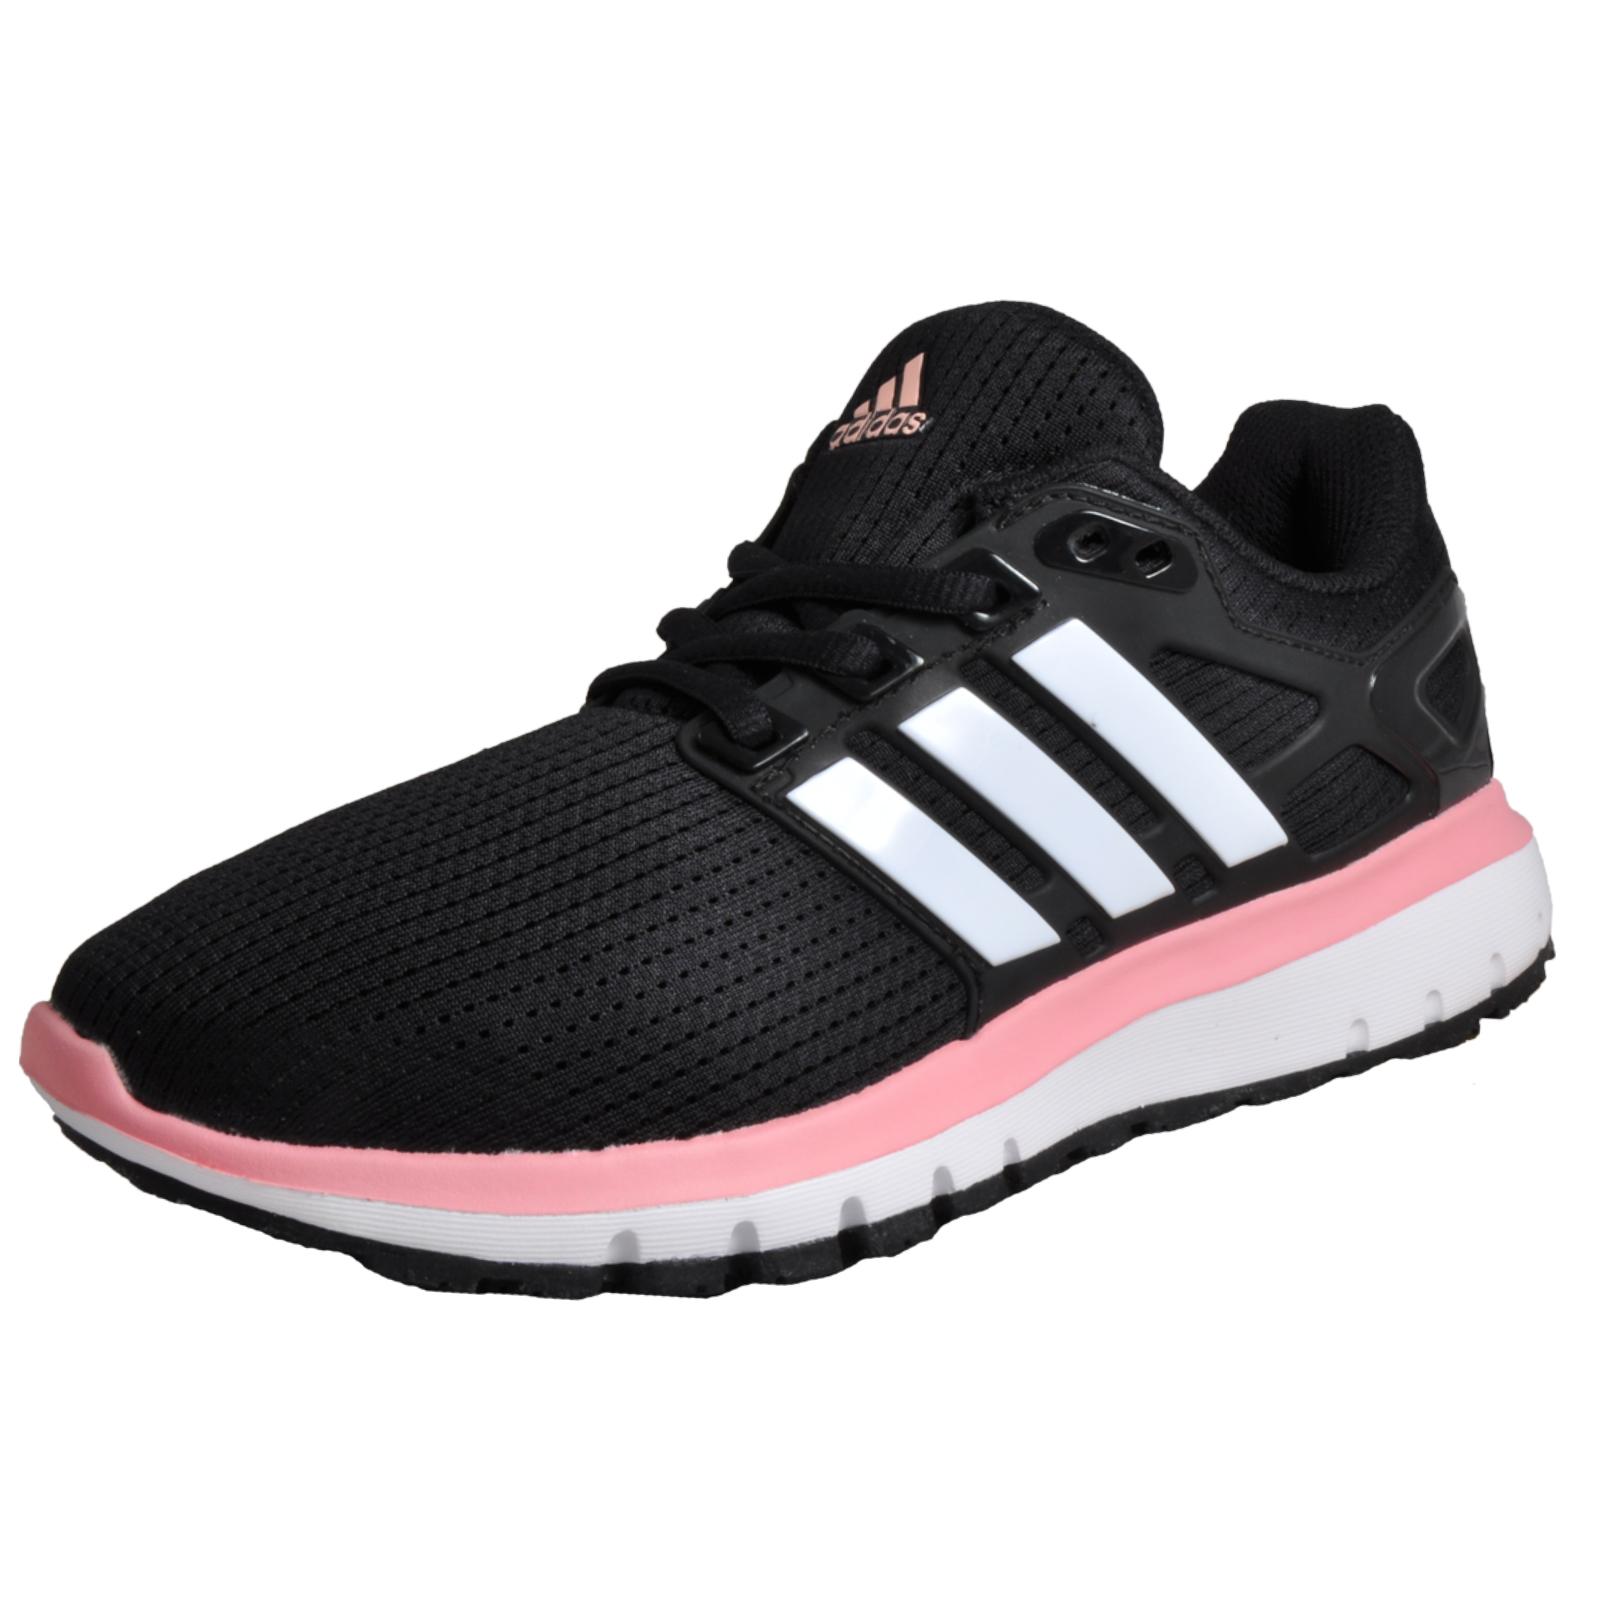 Adidas Energy Cloud WTC mujeres Zapatos Moda Fitness Gym